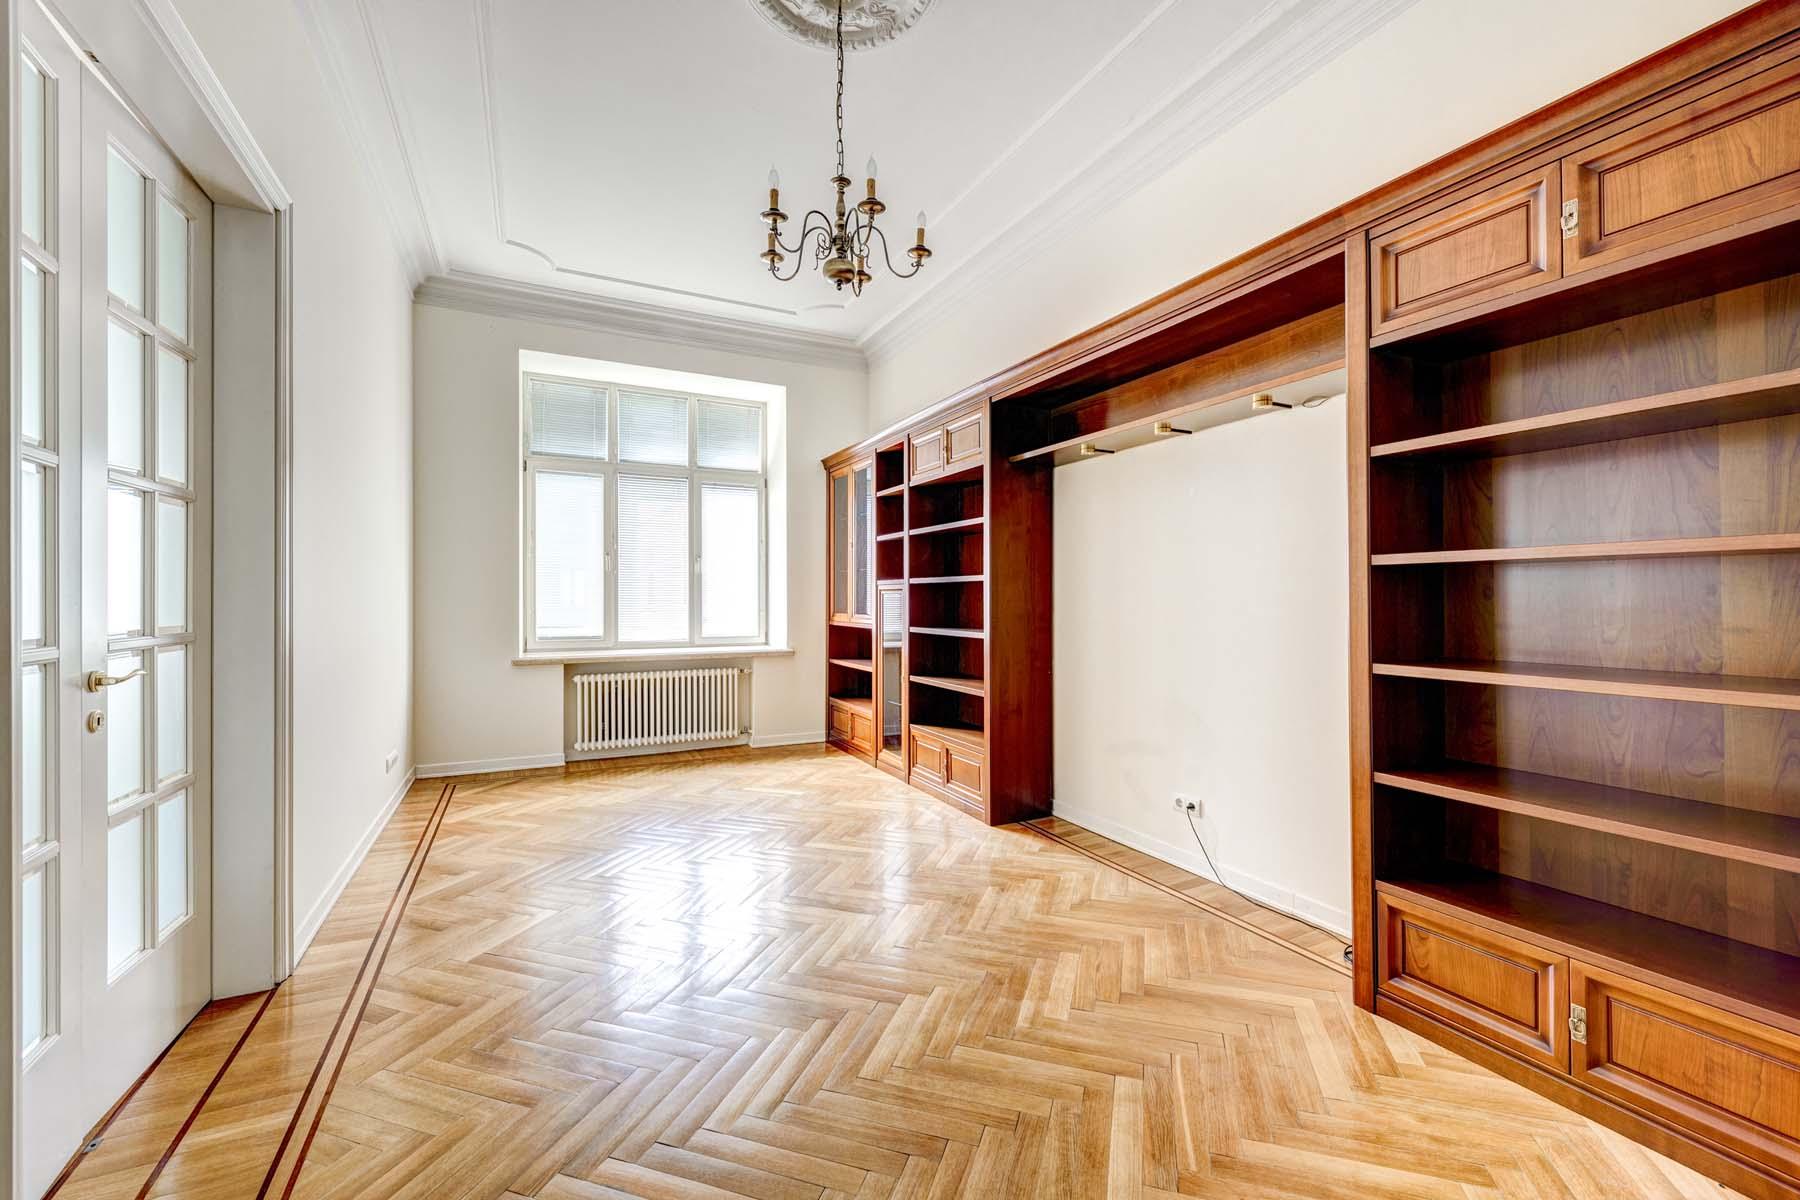 Apartments için Kiralama at Exquisite apartment in prestigious building in Romanov lane Moscow, Moskova Rusya